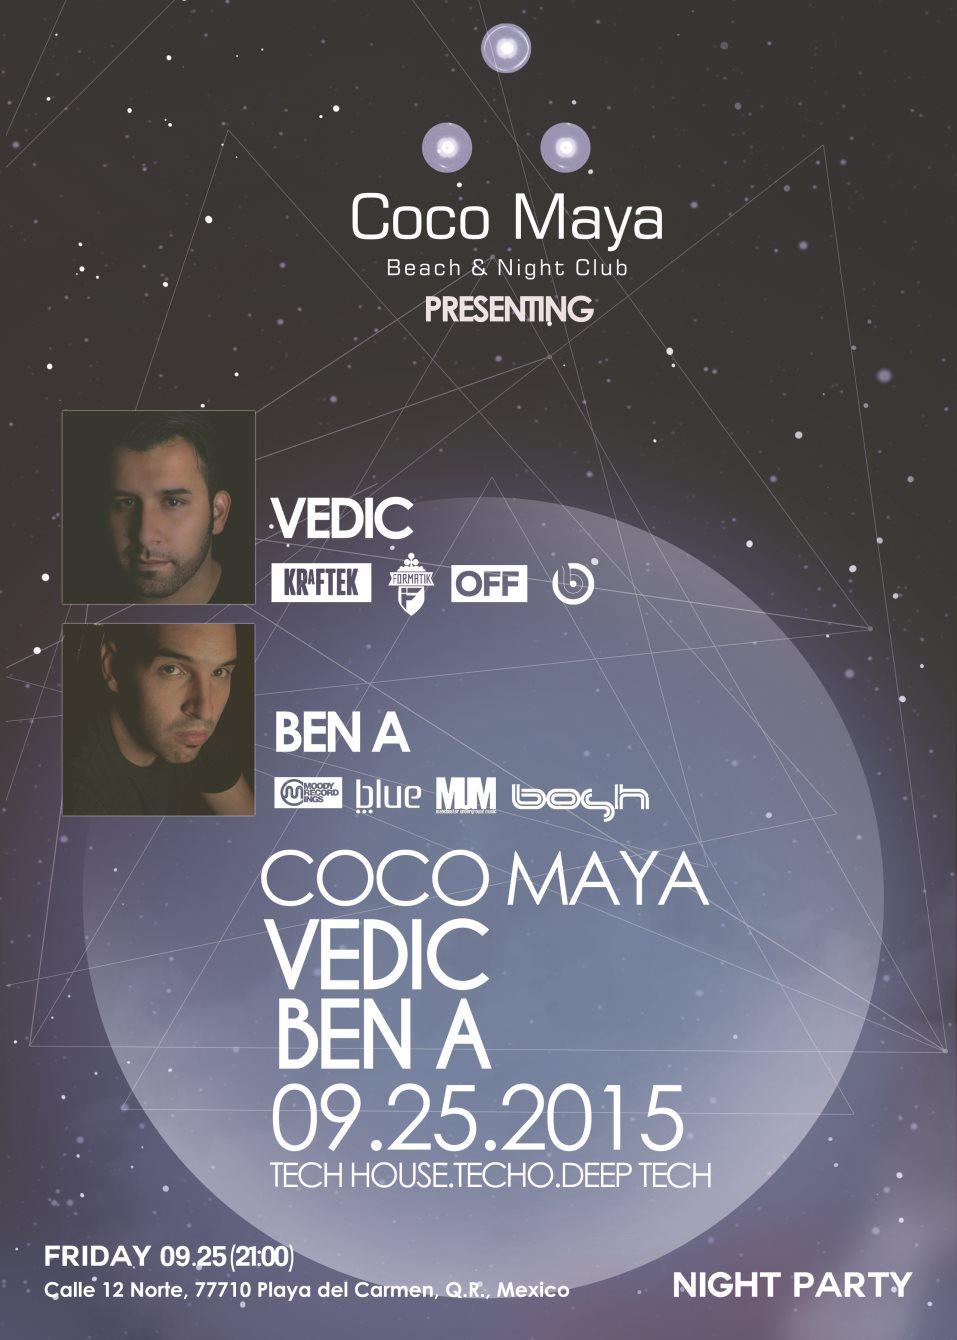 Vedic & Ben A @ Coco Maya - Playa del Carmen